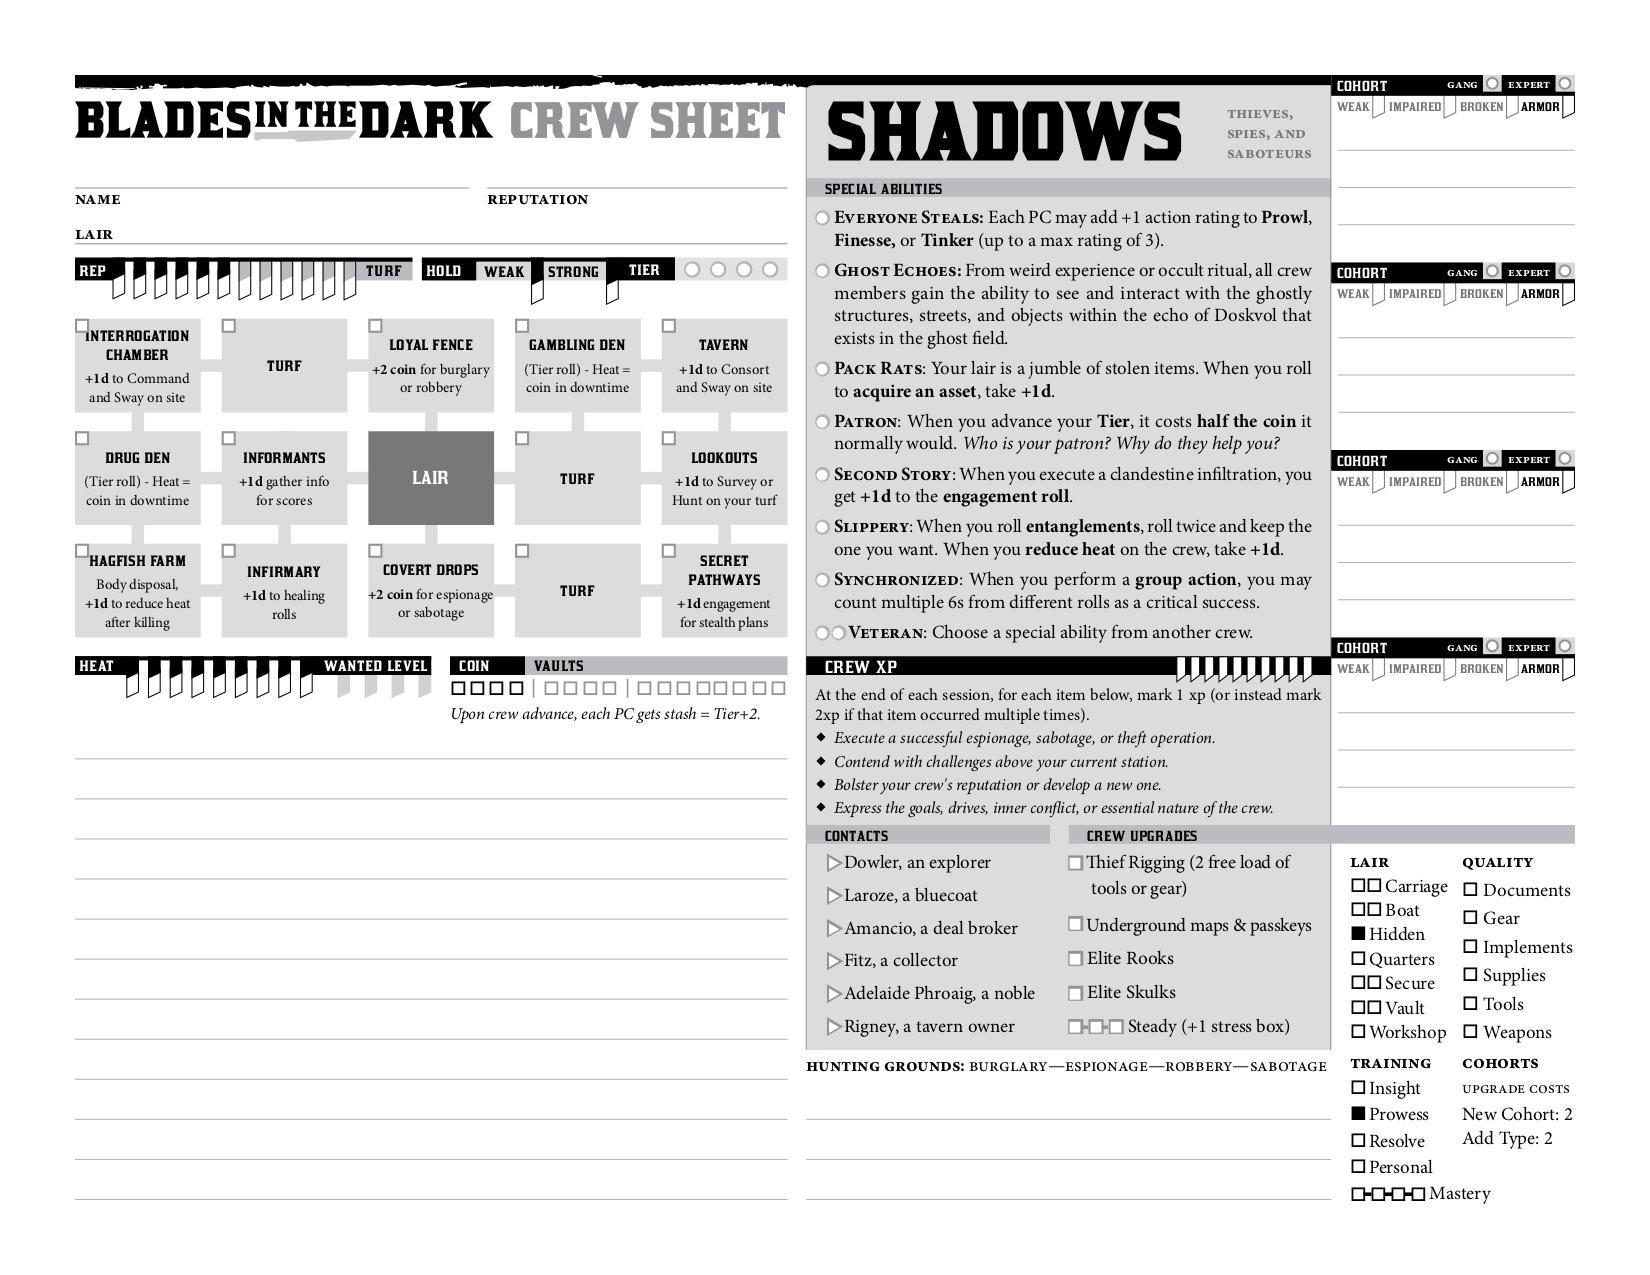 crewsheet-shadows.jpg